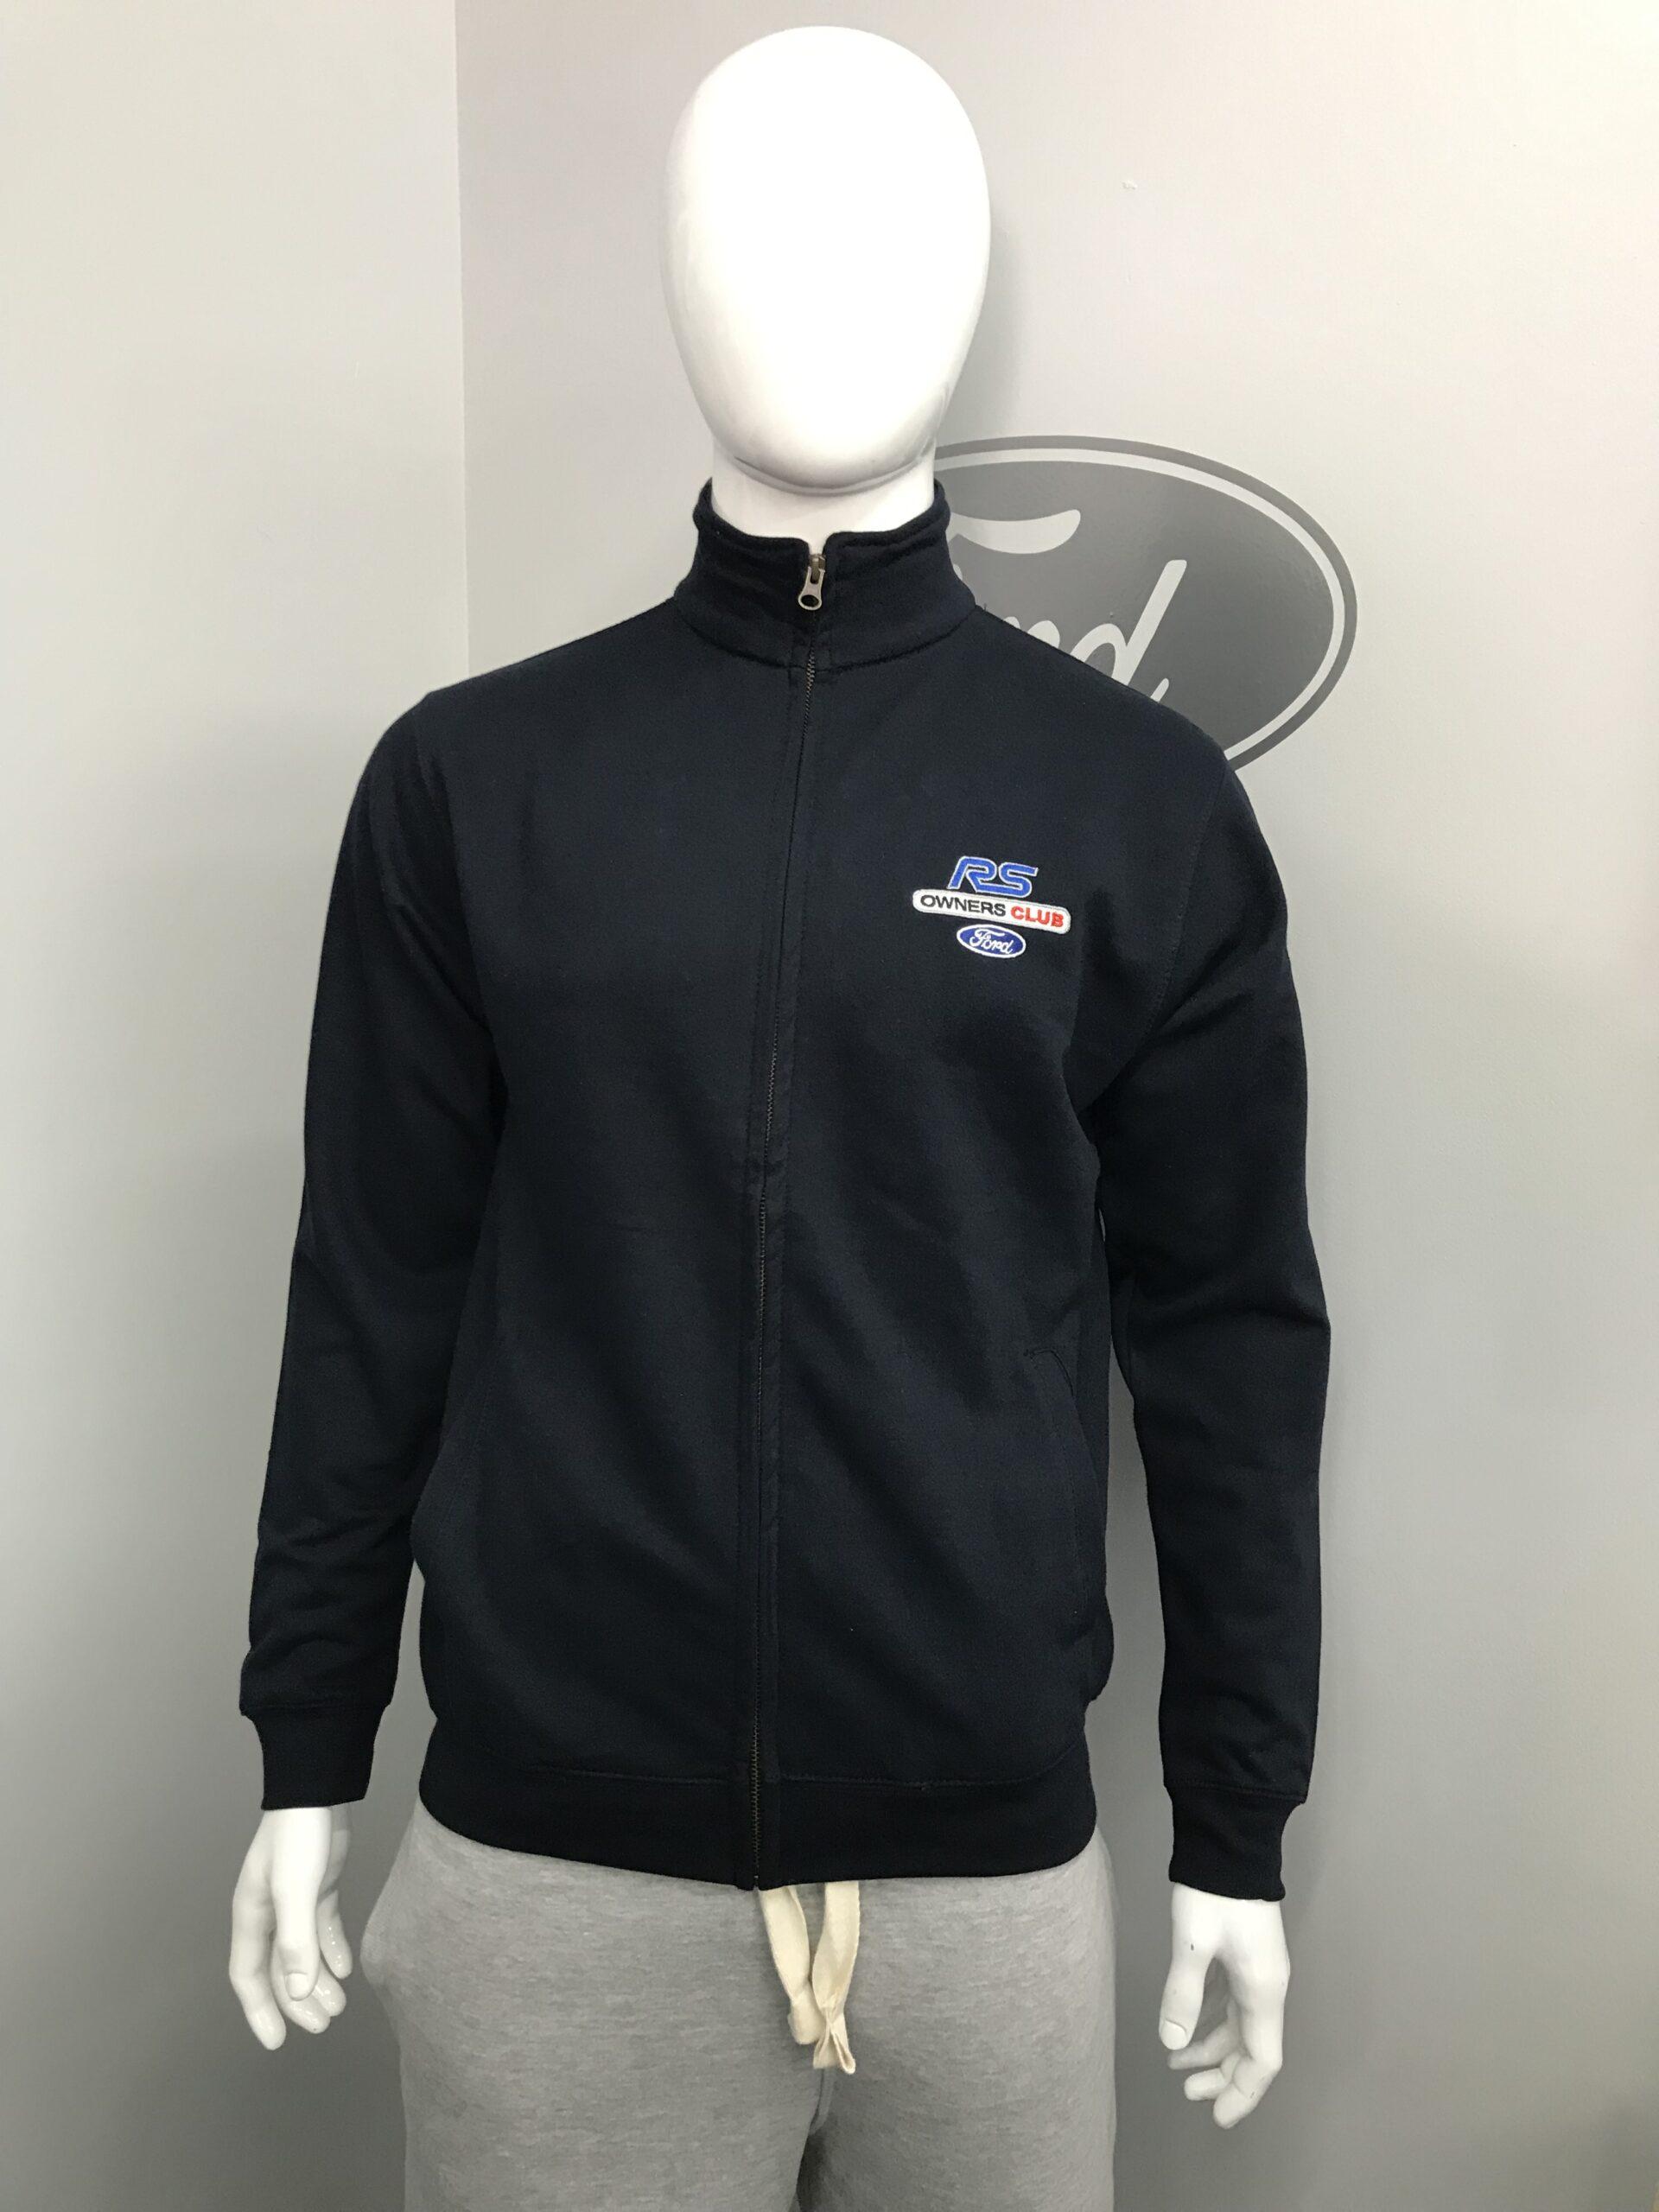 RSOC Full Zip Sweatshirt